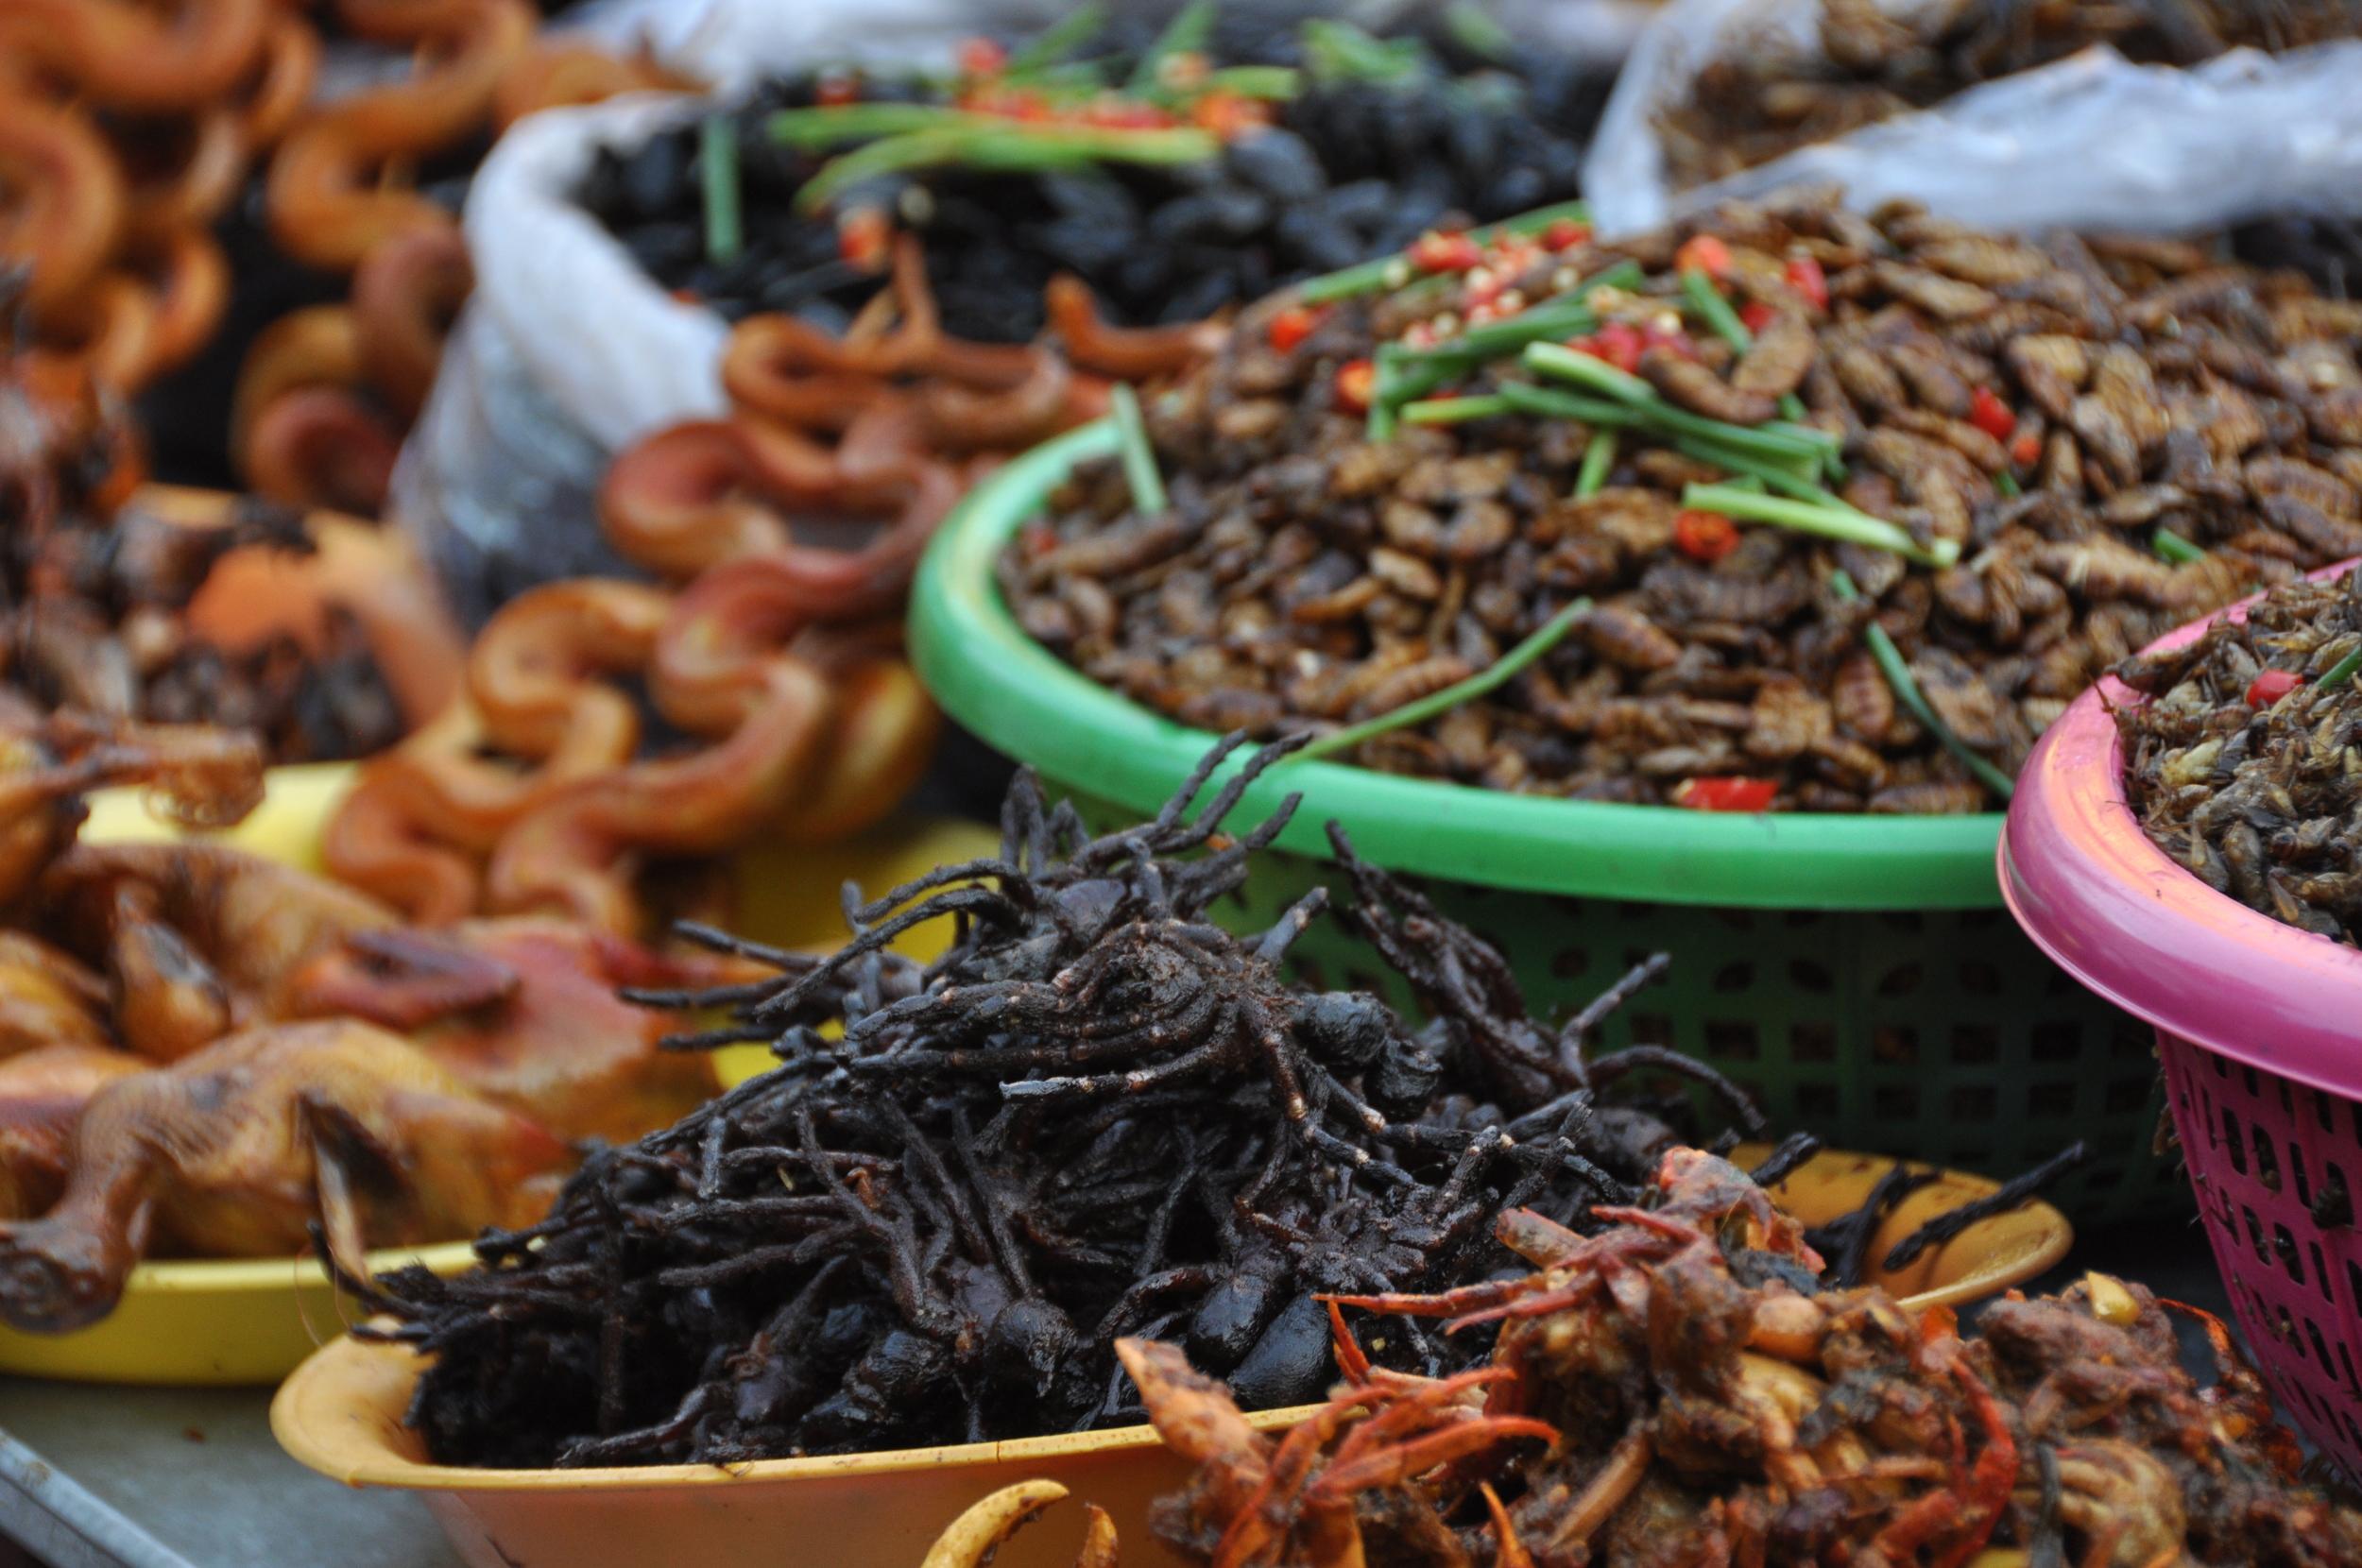 crispy-fried creepy crawlies at the street market